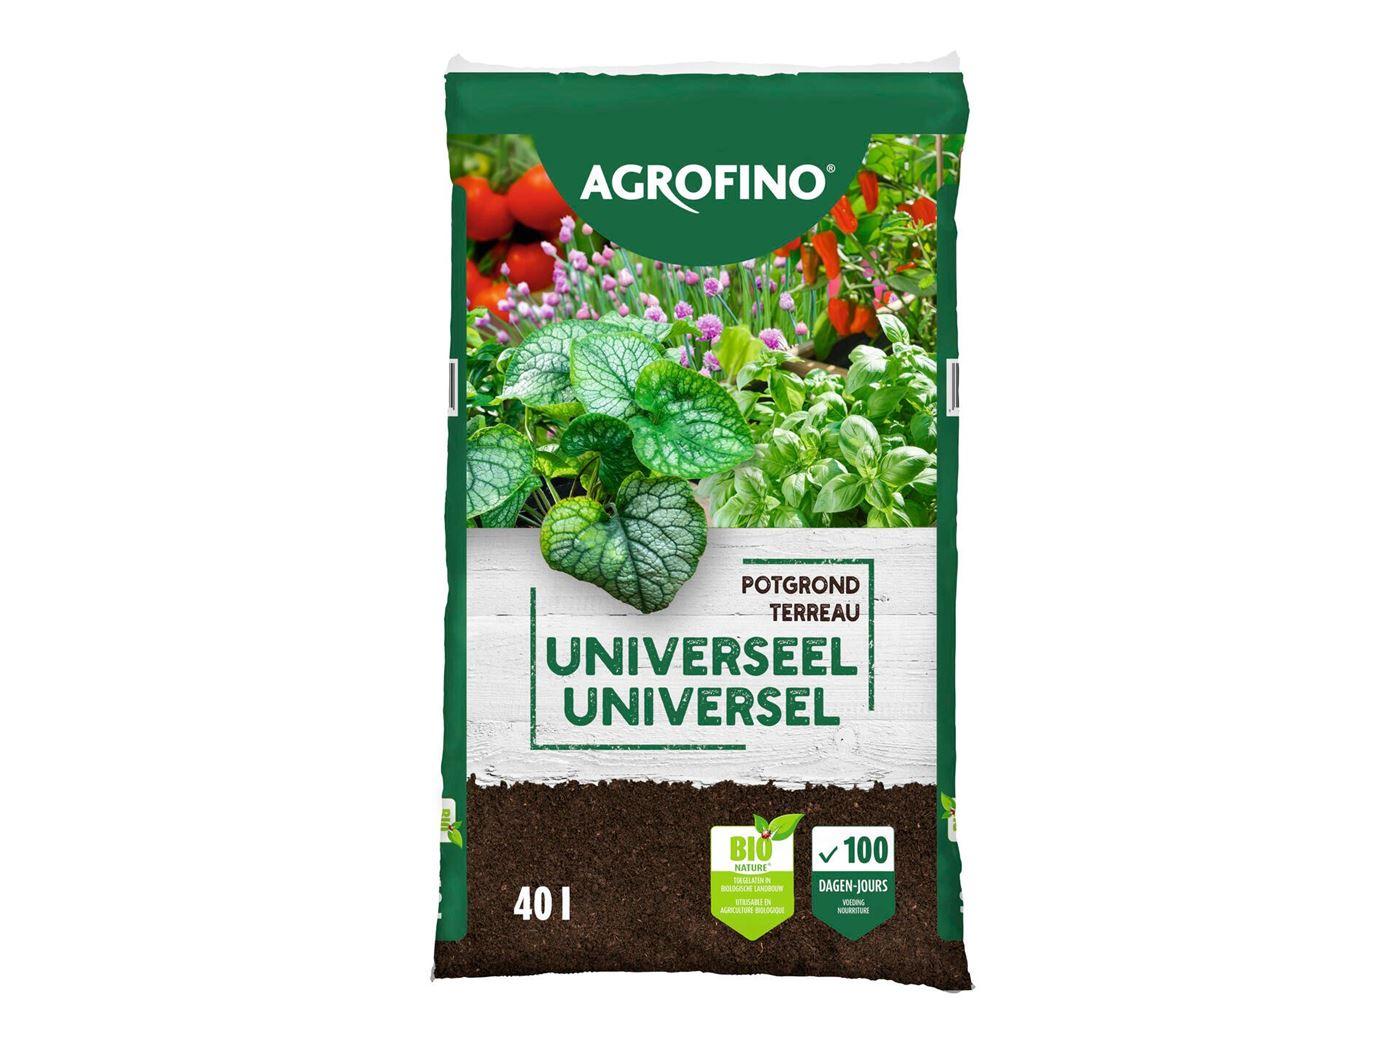 agrofino universele potgrond bionature